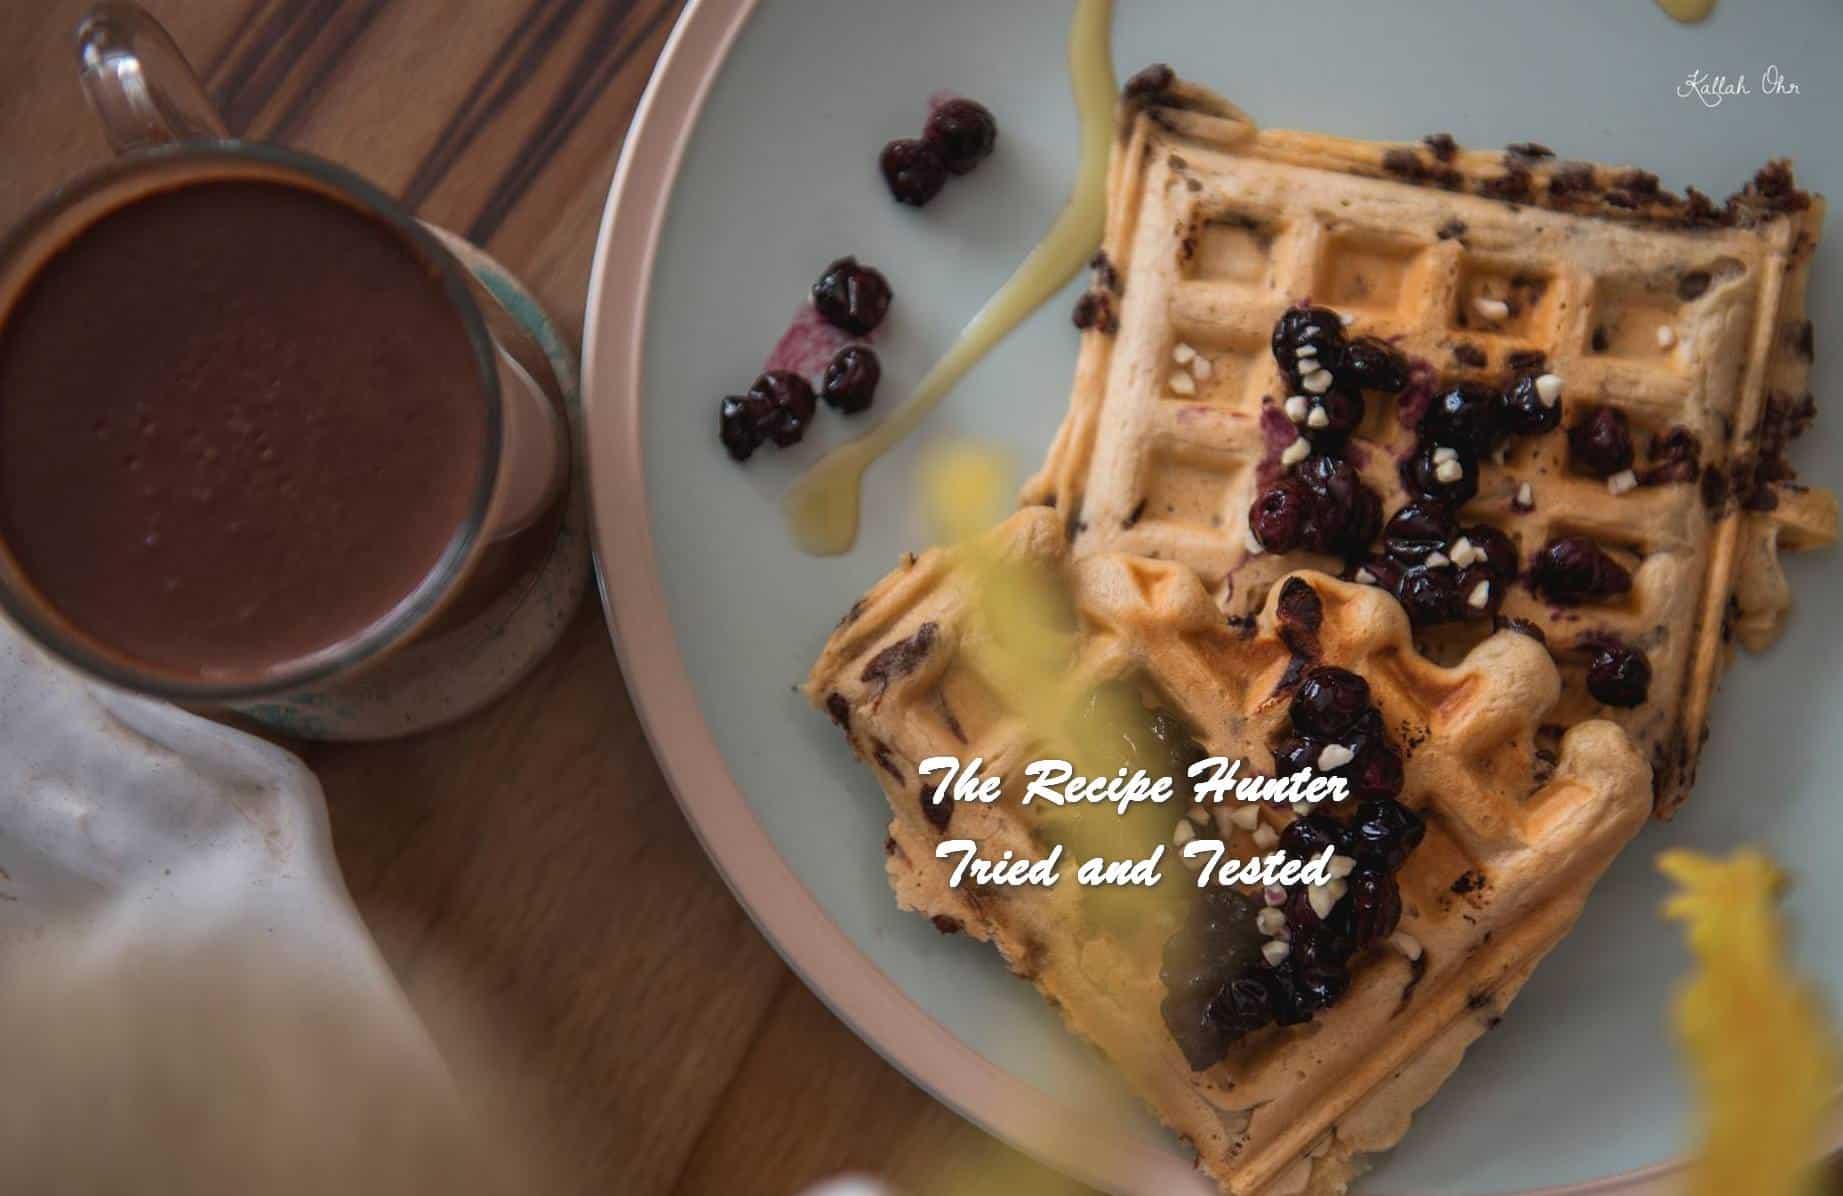 Carla's Choc Chip Blueberry Vegan Waffles